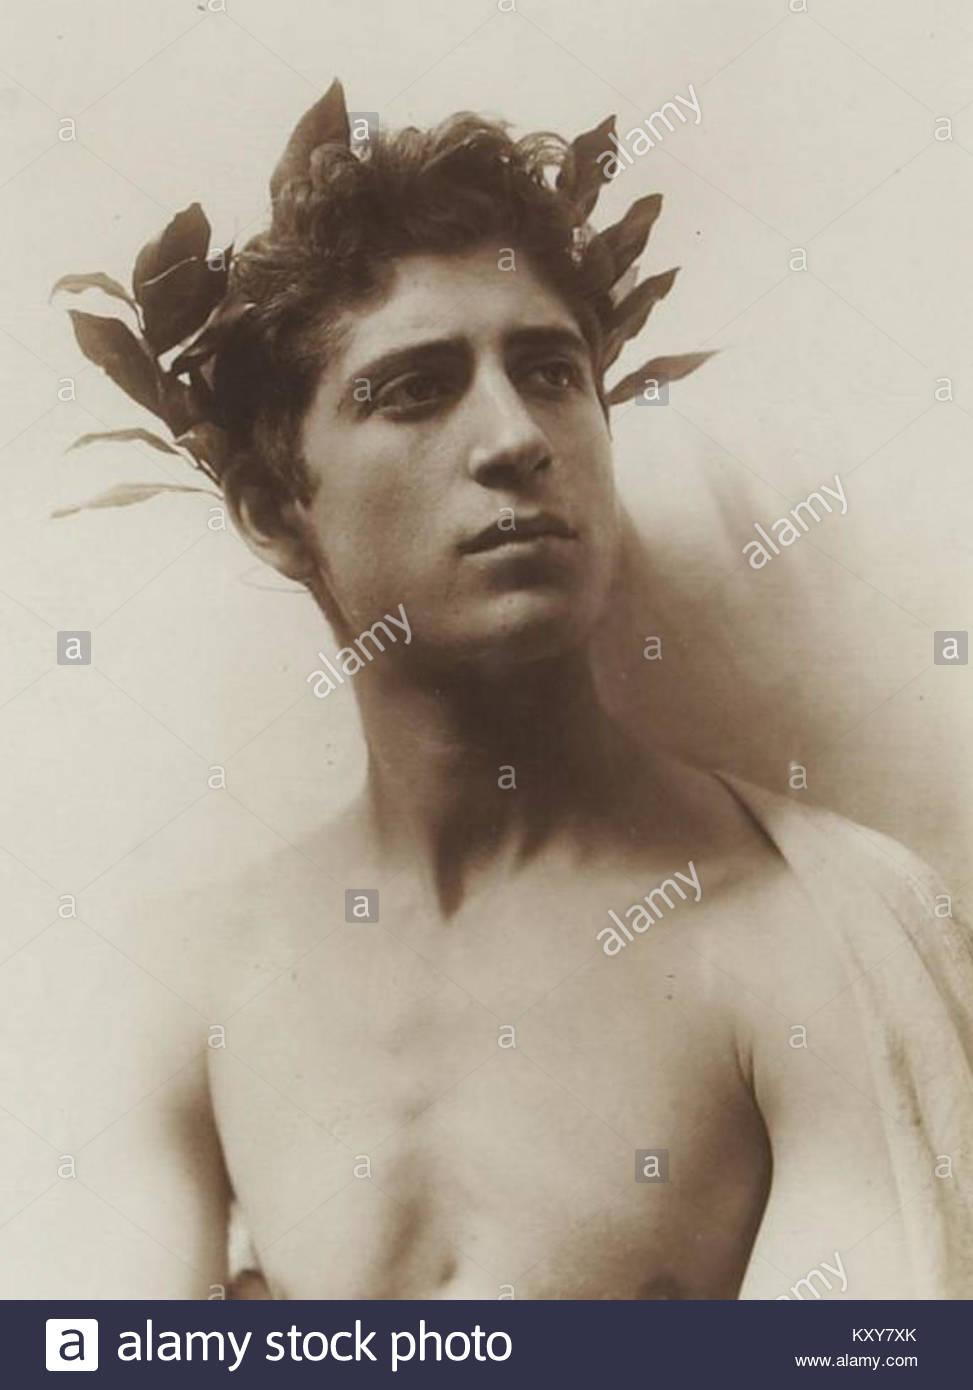 Gloeden, Wilhelm von (1856-1931) - n. 1590 - Adolescente laureato - Sito del Musée d'Orsay Immagini Stock